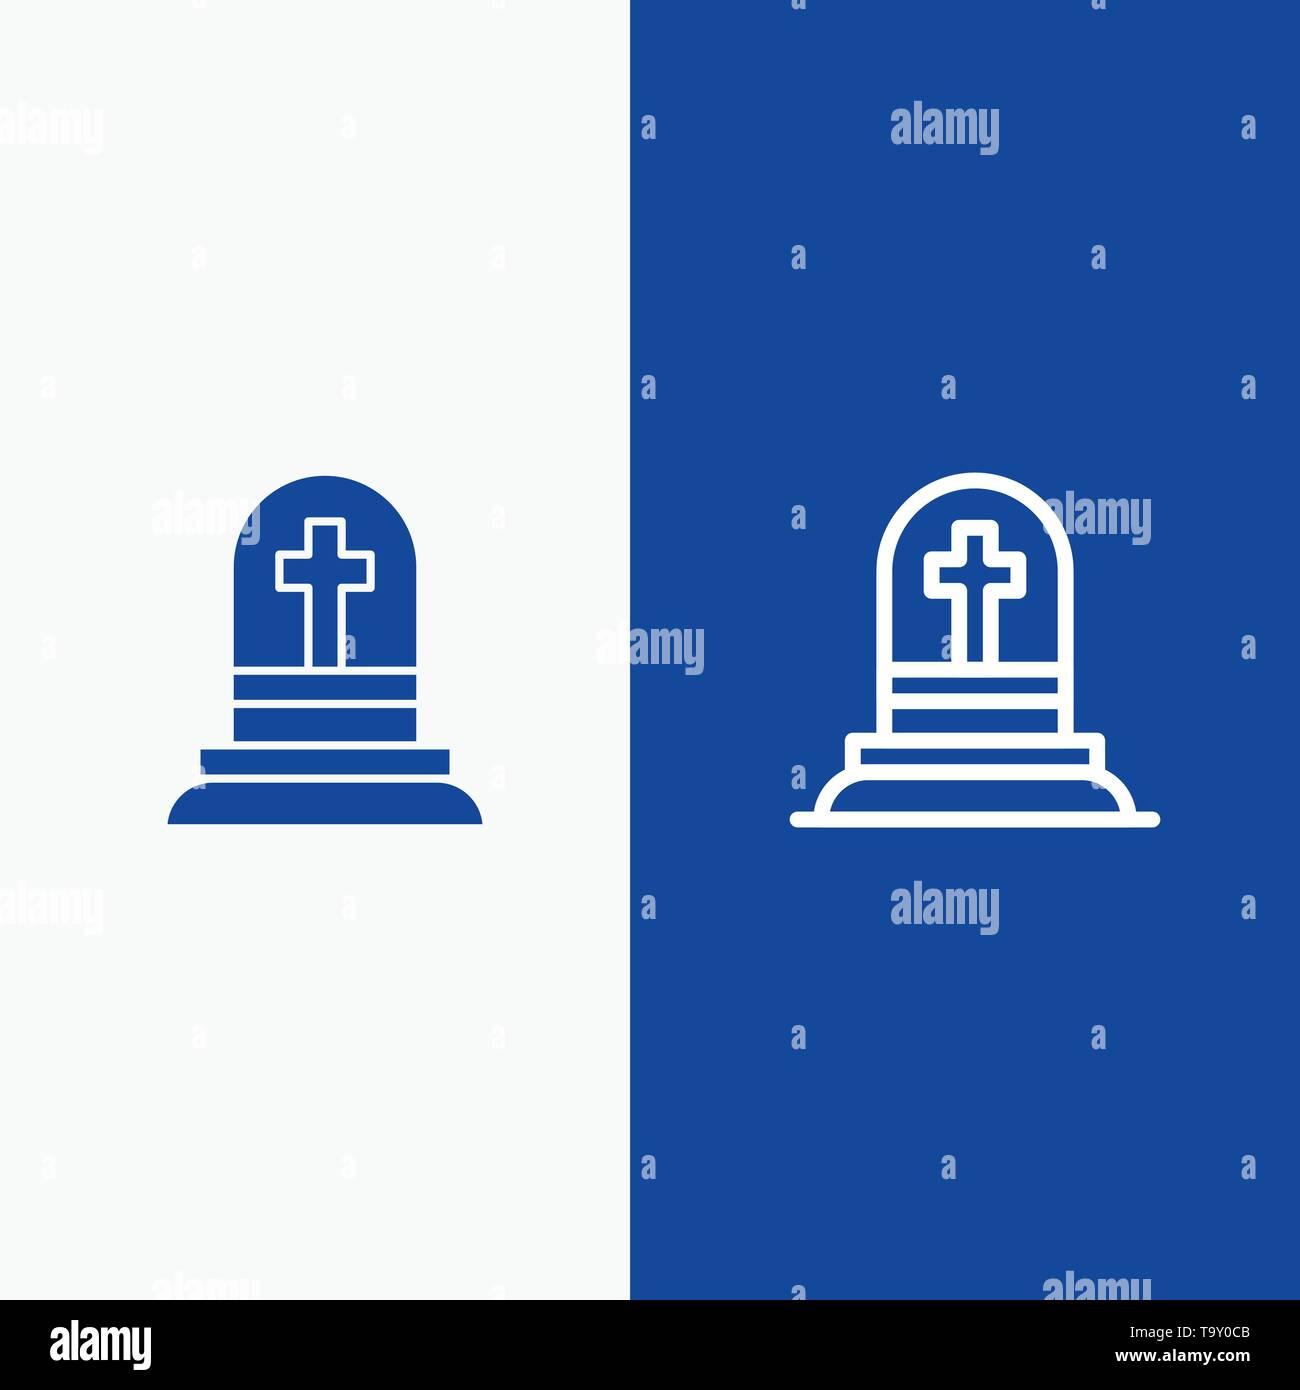 Death, Grave, Gravestone, Rip Line and Glyph Solid icon Blue banner Line and Glyph Solid icon Blue banner - Stock Image